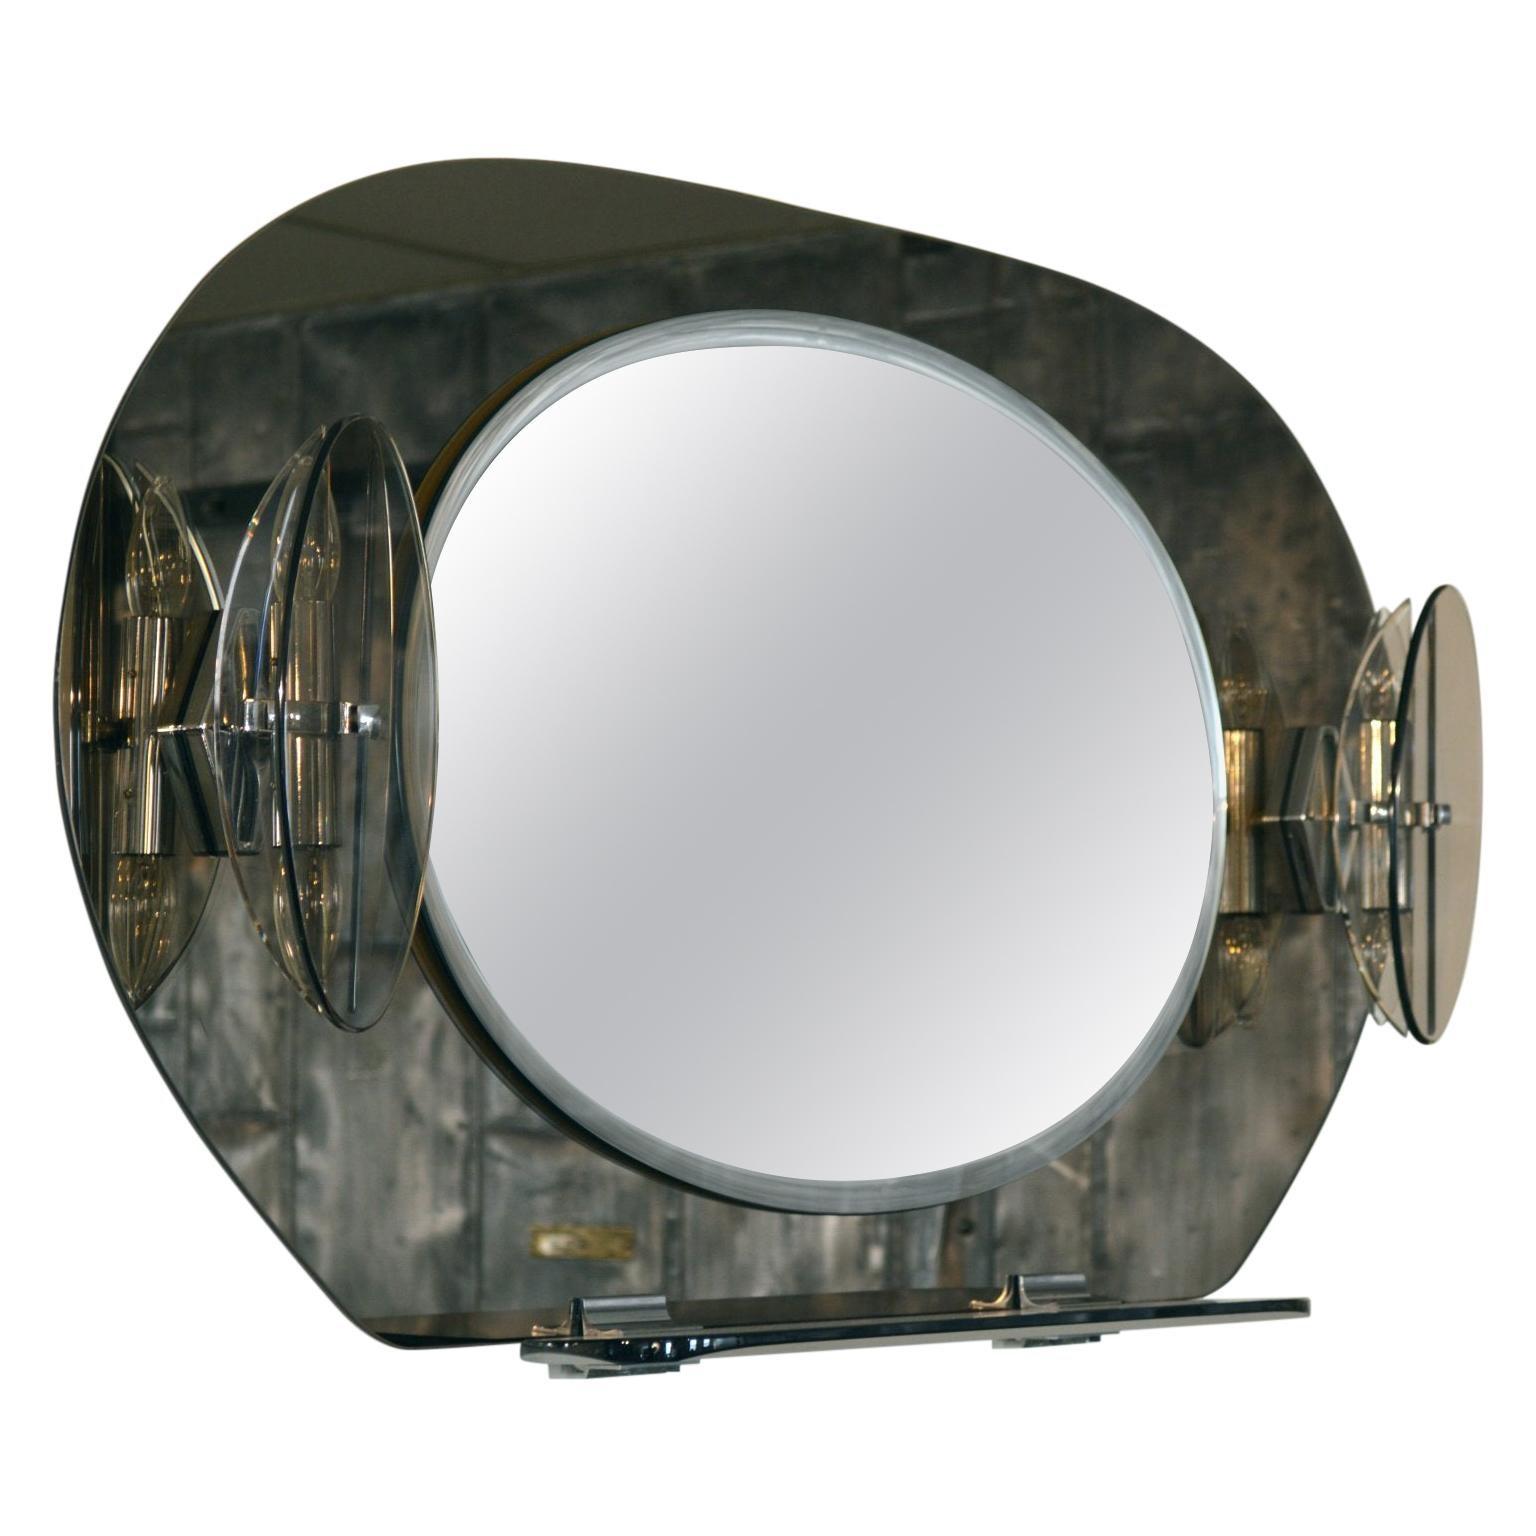 Fontana Arte Smoked Glass Lighted Vanity Mirror with shelves